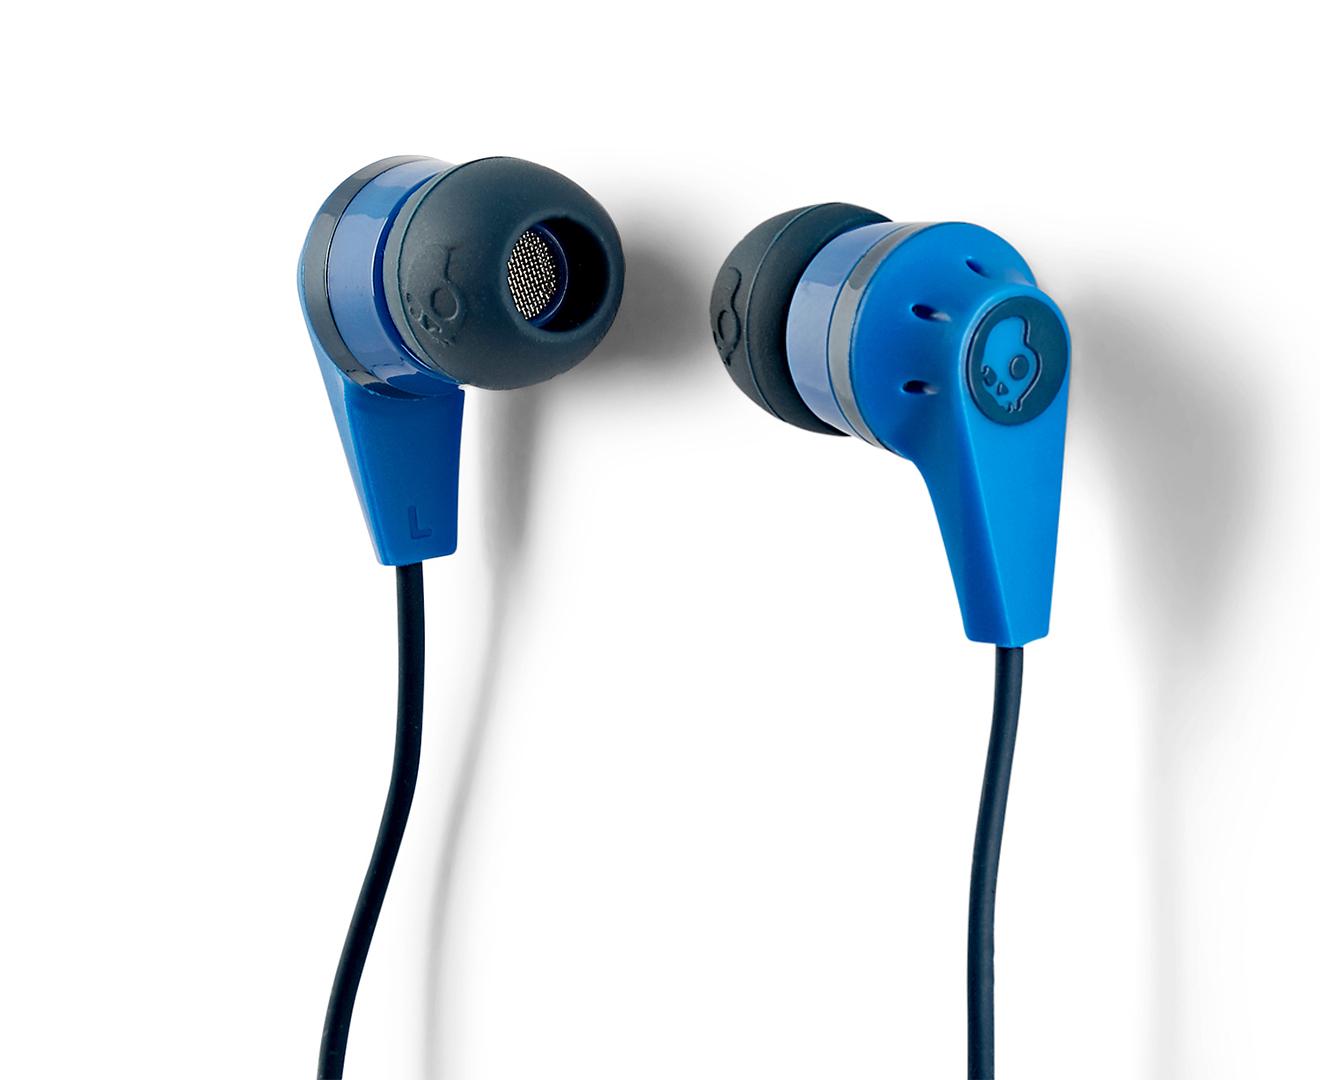 Earbuds skullcandy ink'd 2.0 - bluetooth sport earbuds sweatproof skullcandy